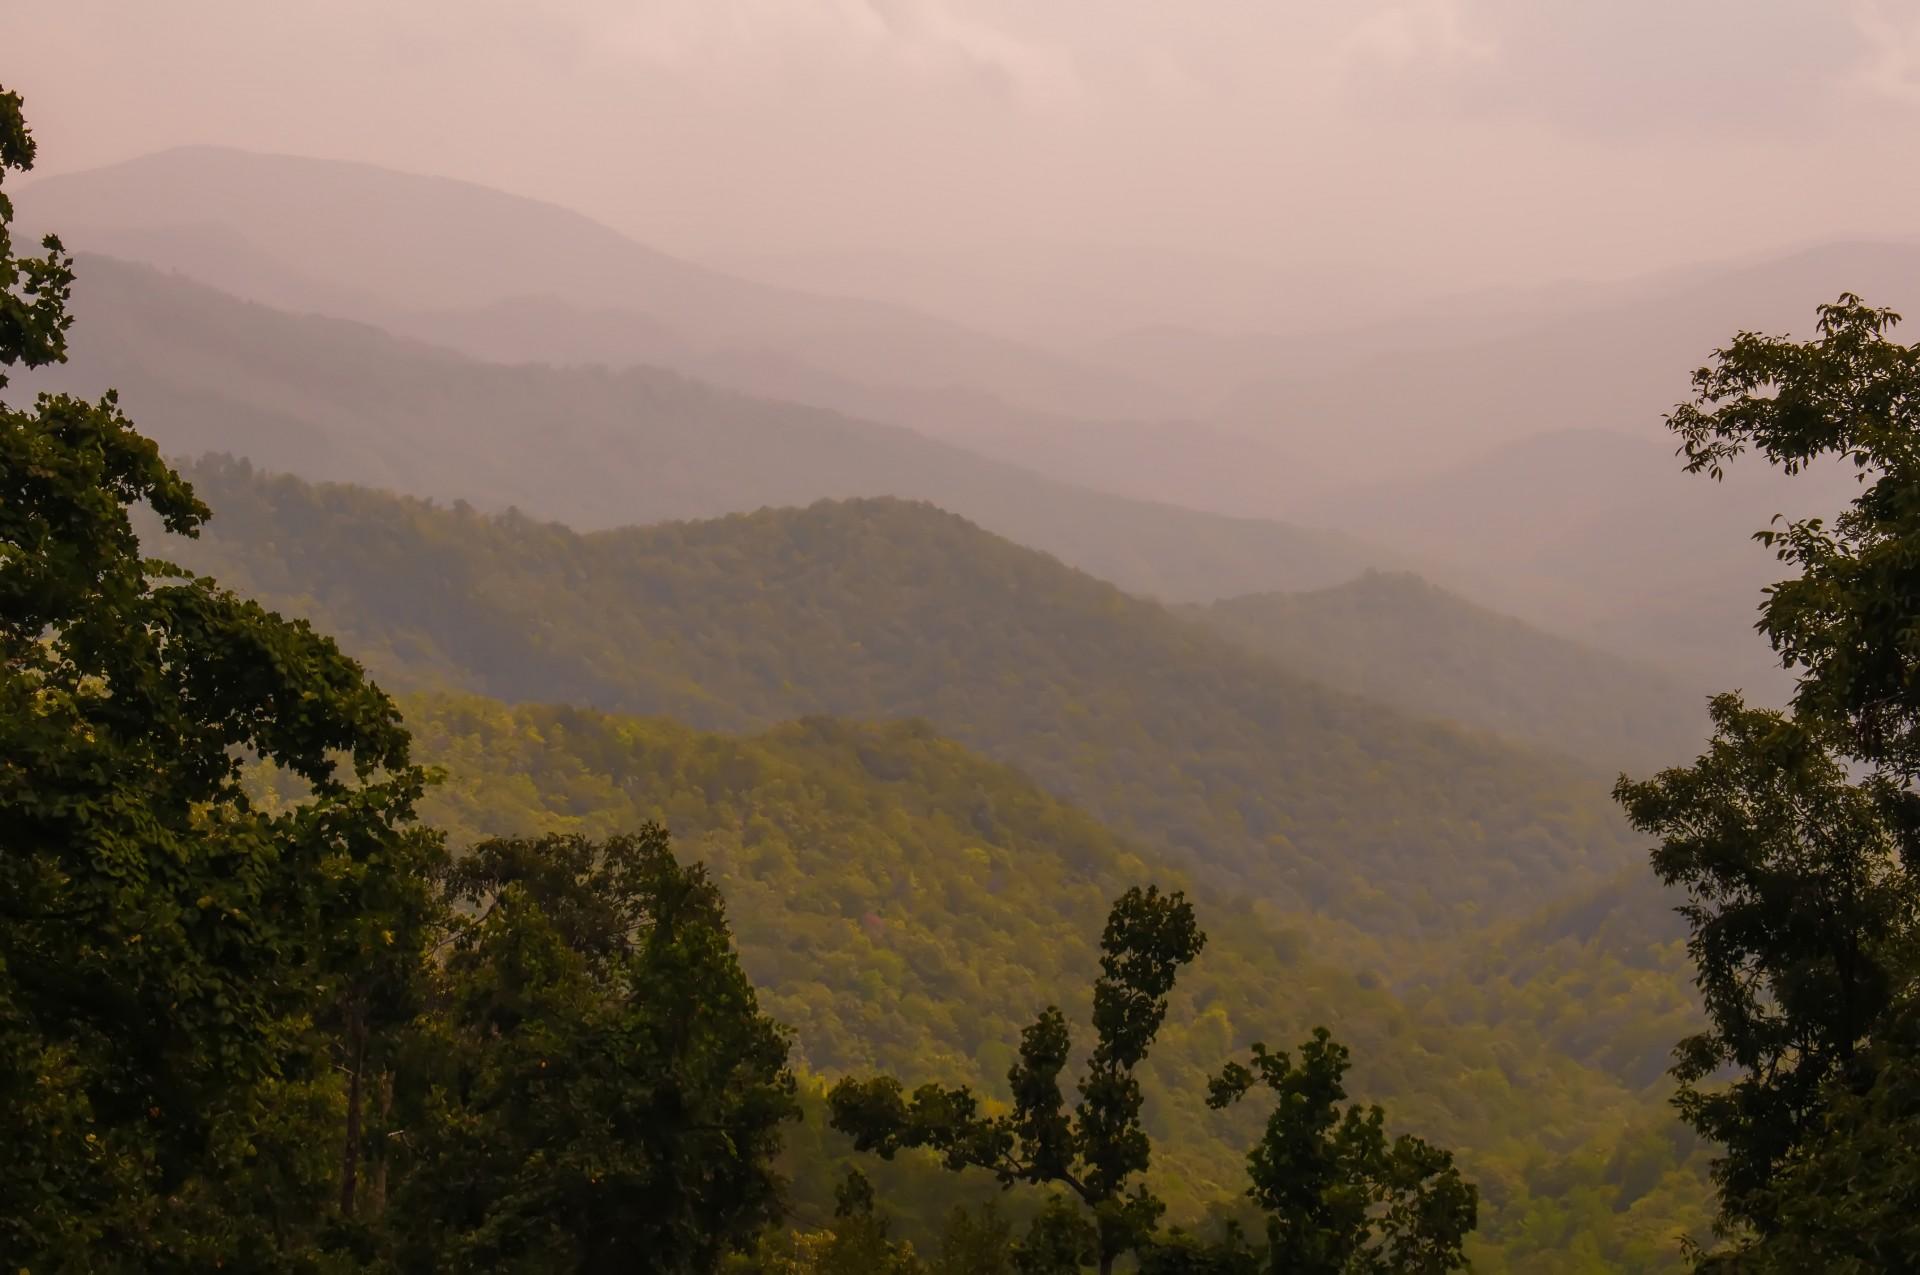 blue-ridge-mountains-in-fog